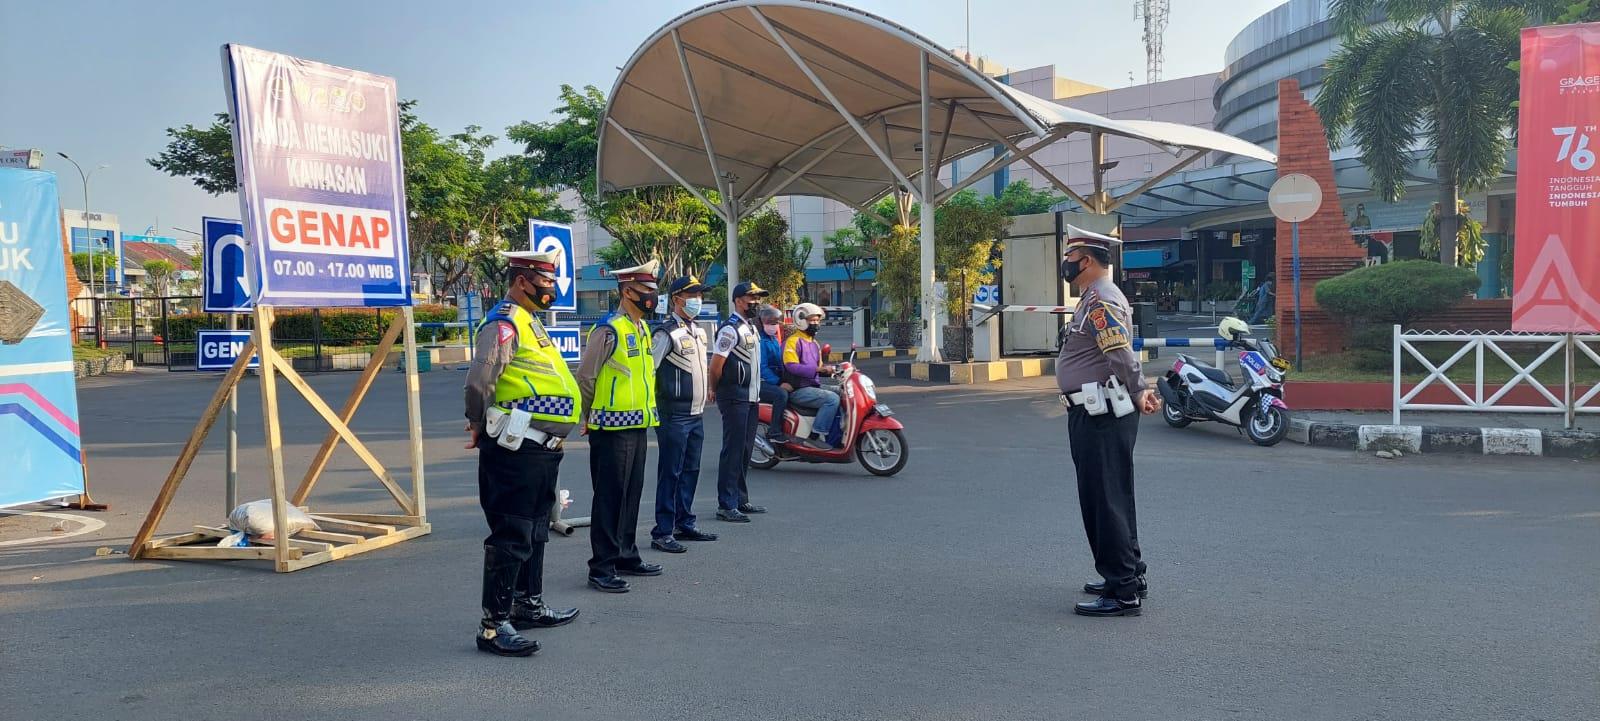 Gabungan Personil Pos Pemberlakuan Ganjil Genap di Kejaksan Wilkum Polres Cirebon Kota Siap Siaga